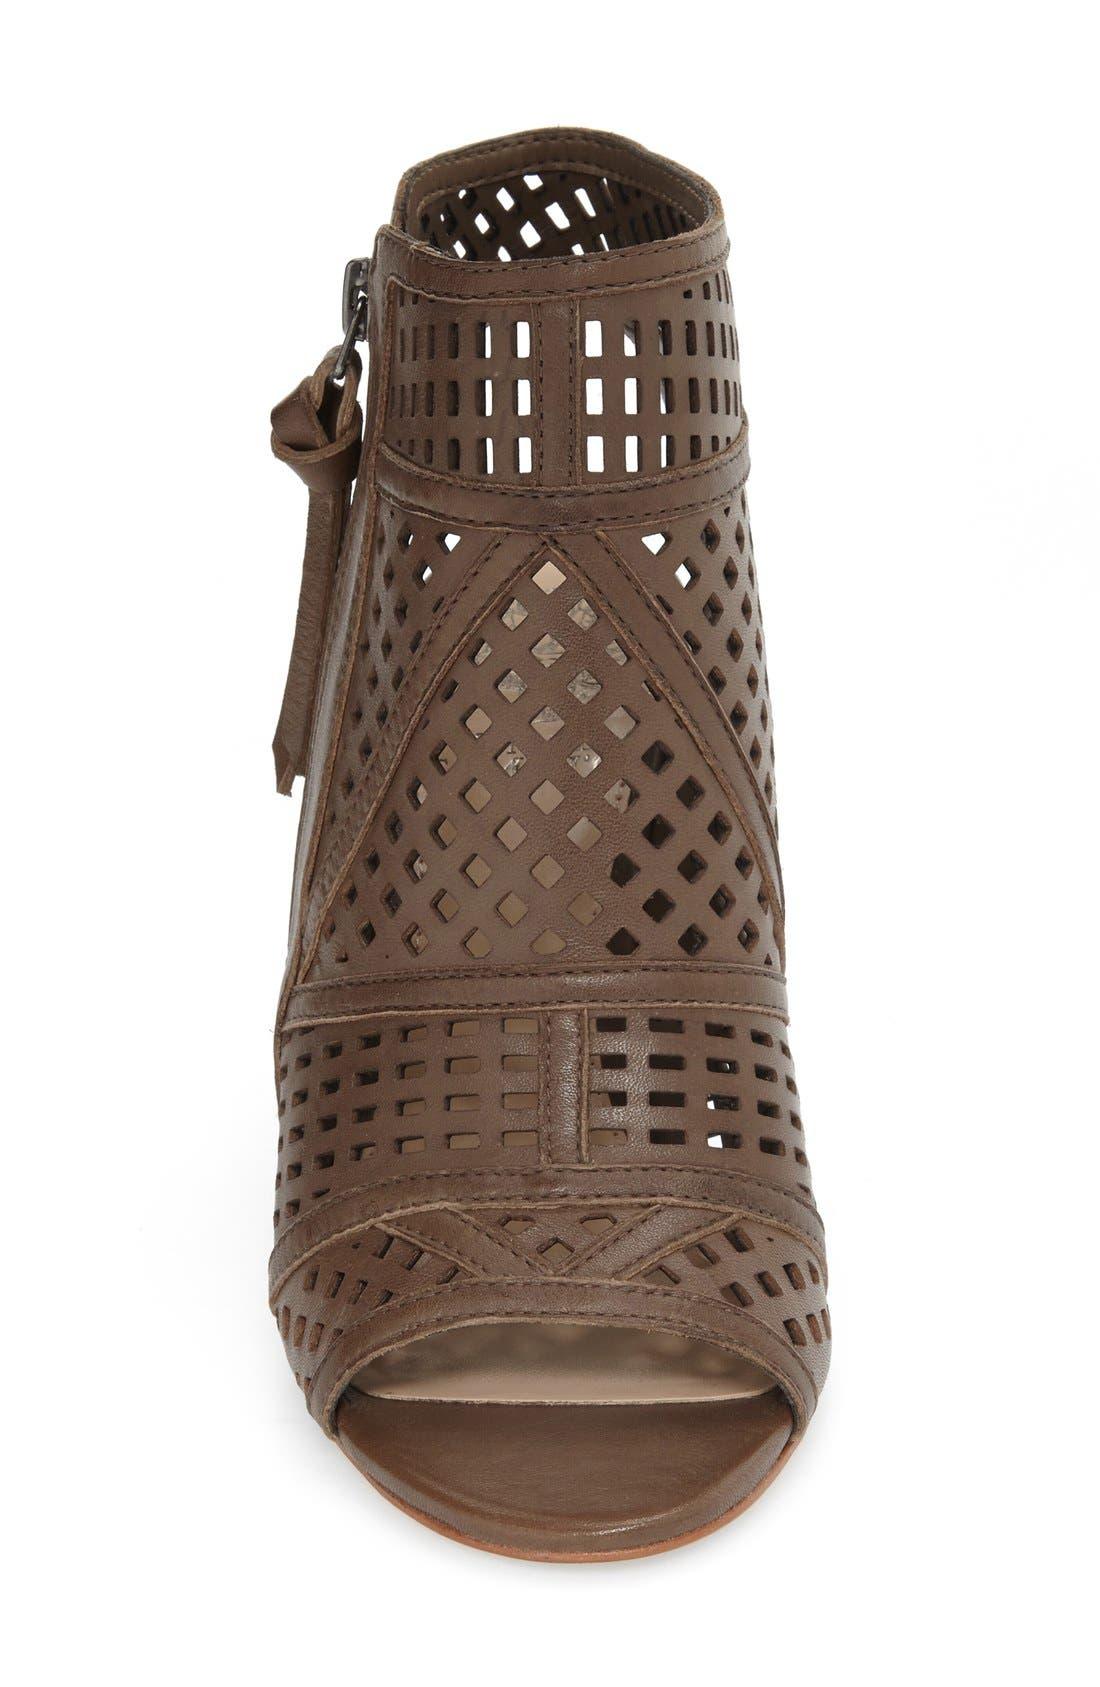 Alternate Image 3  - Vince Camuto 'Xabrina' Perforated Wedge Sandal (Women)